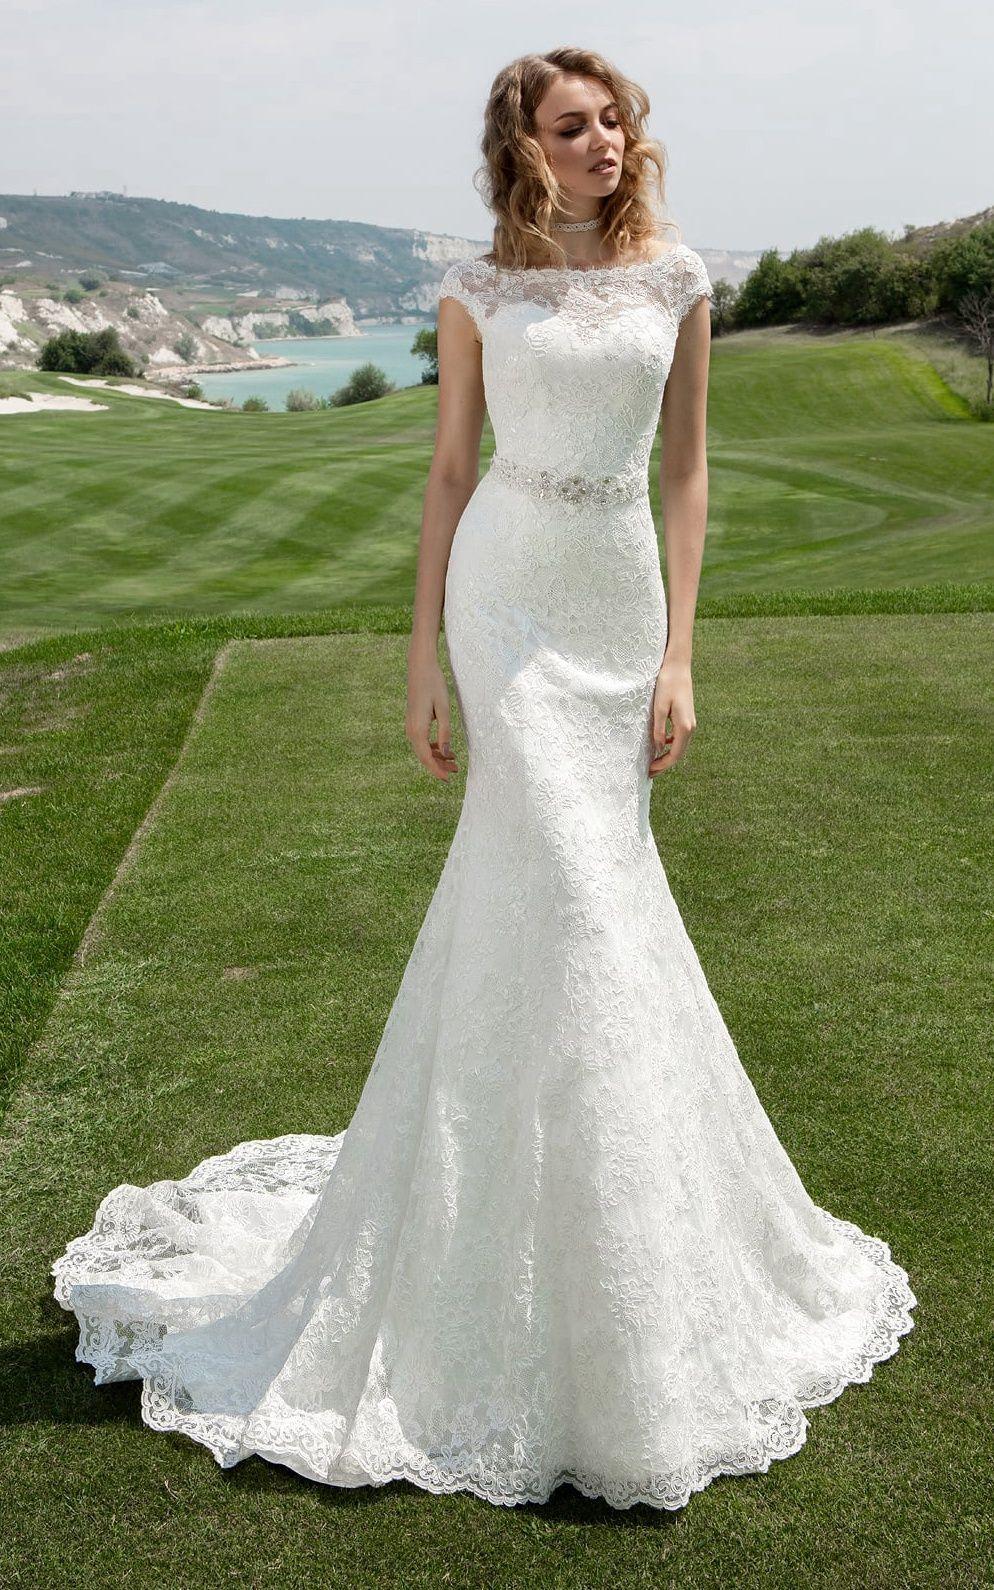 Your Vintage Romance Sophisticated Lace Wedding Dress Now On Sale 142 13 Www Dorisweddi Sheath Wedding Dress Lace Short Sleeve Wedding Dress Wedding Dresses [ 1590 x 994 Pixel ]